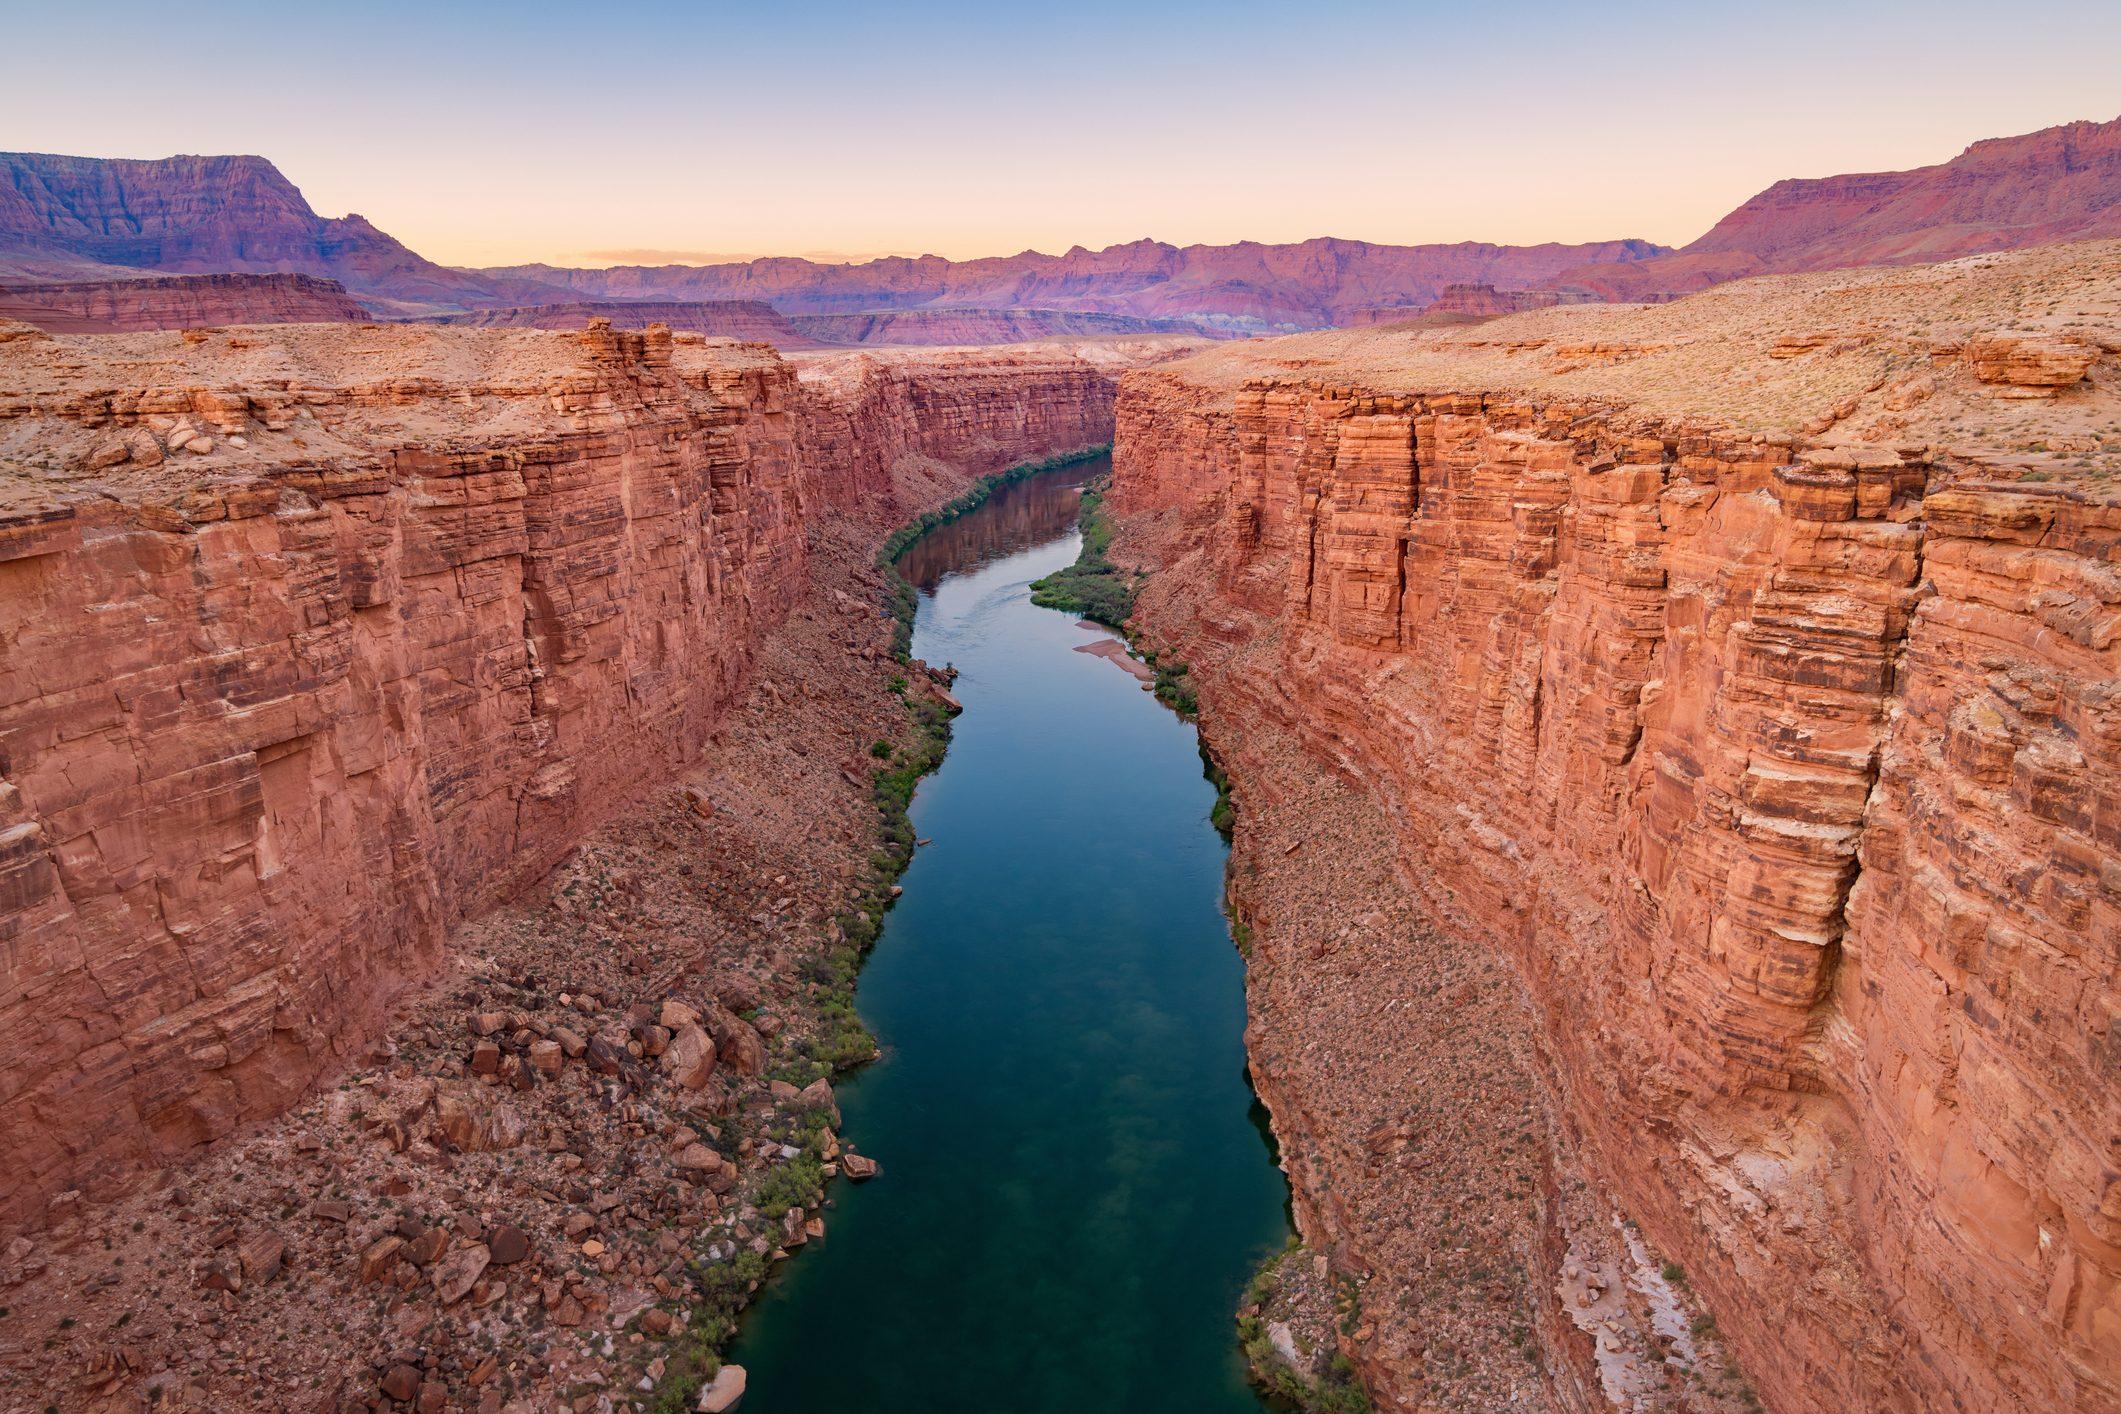 Marble Canyon and Colorado River in Arizona USA